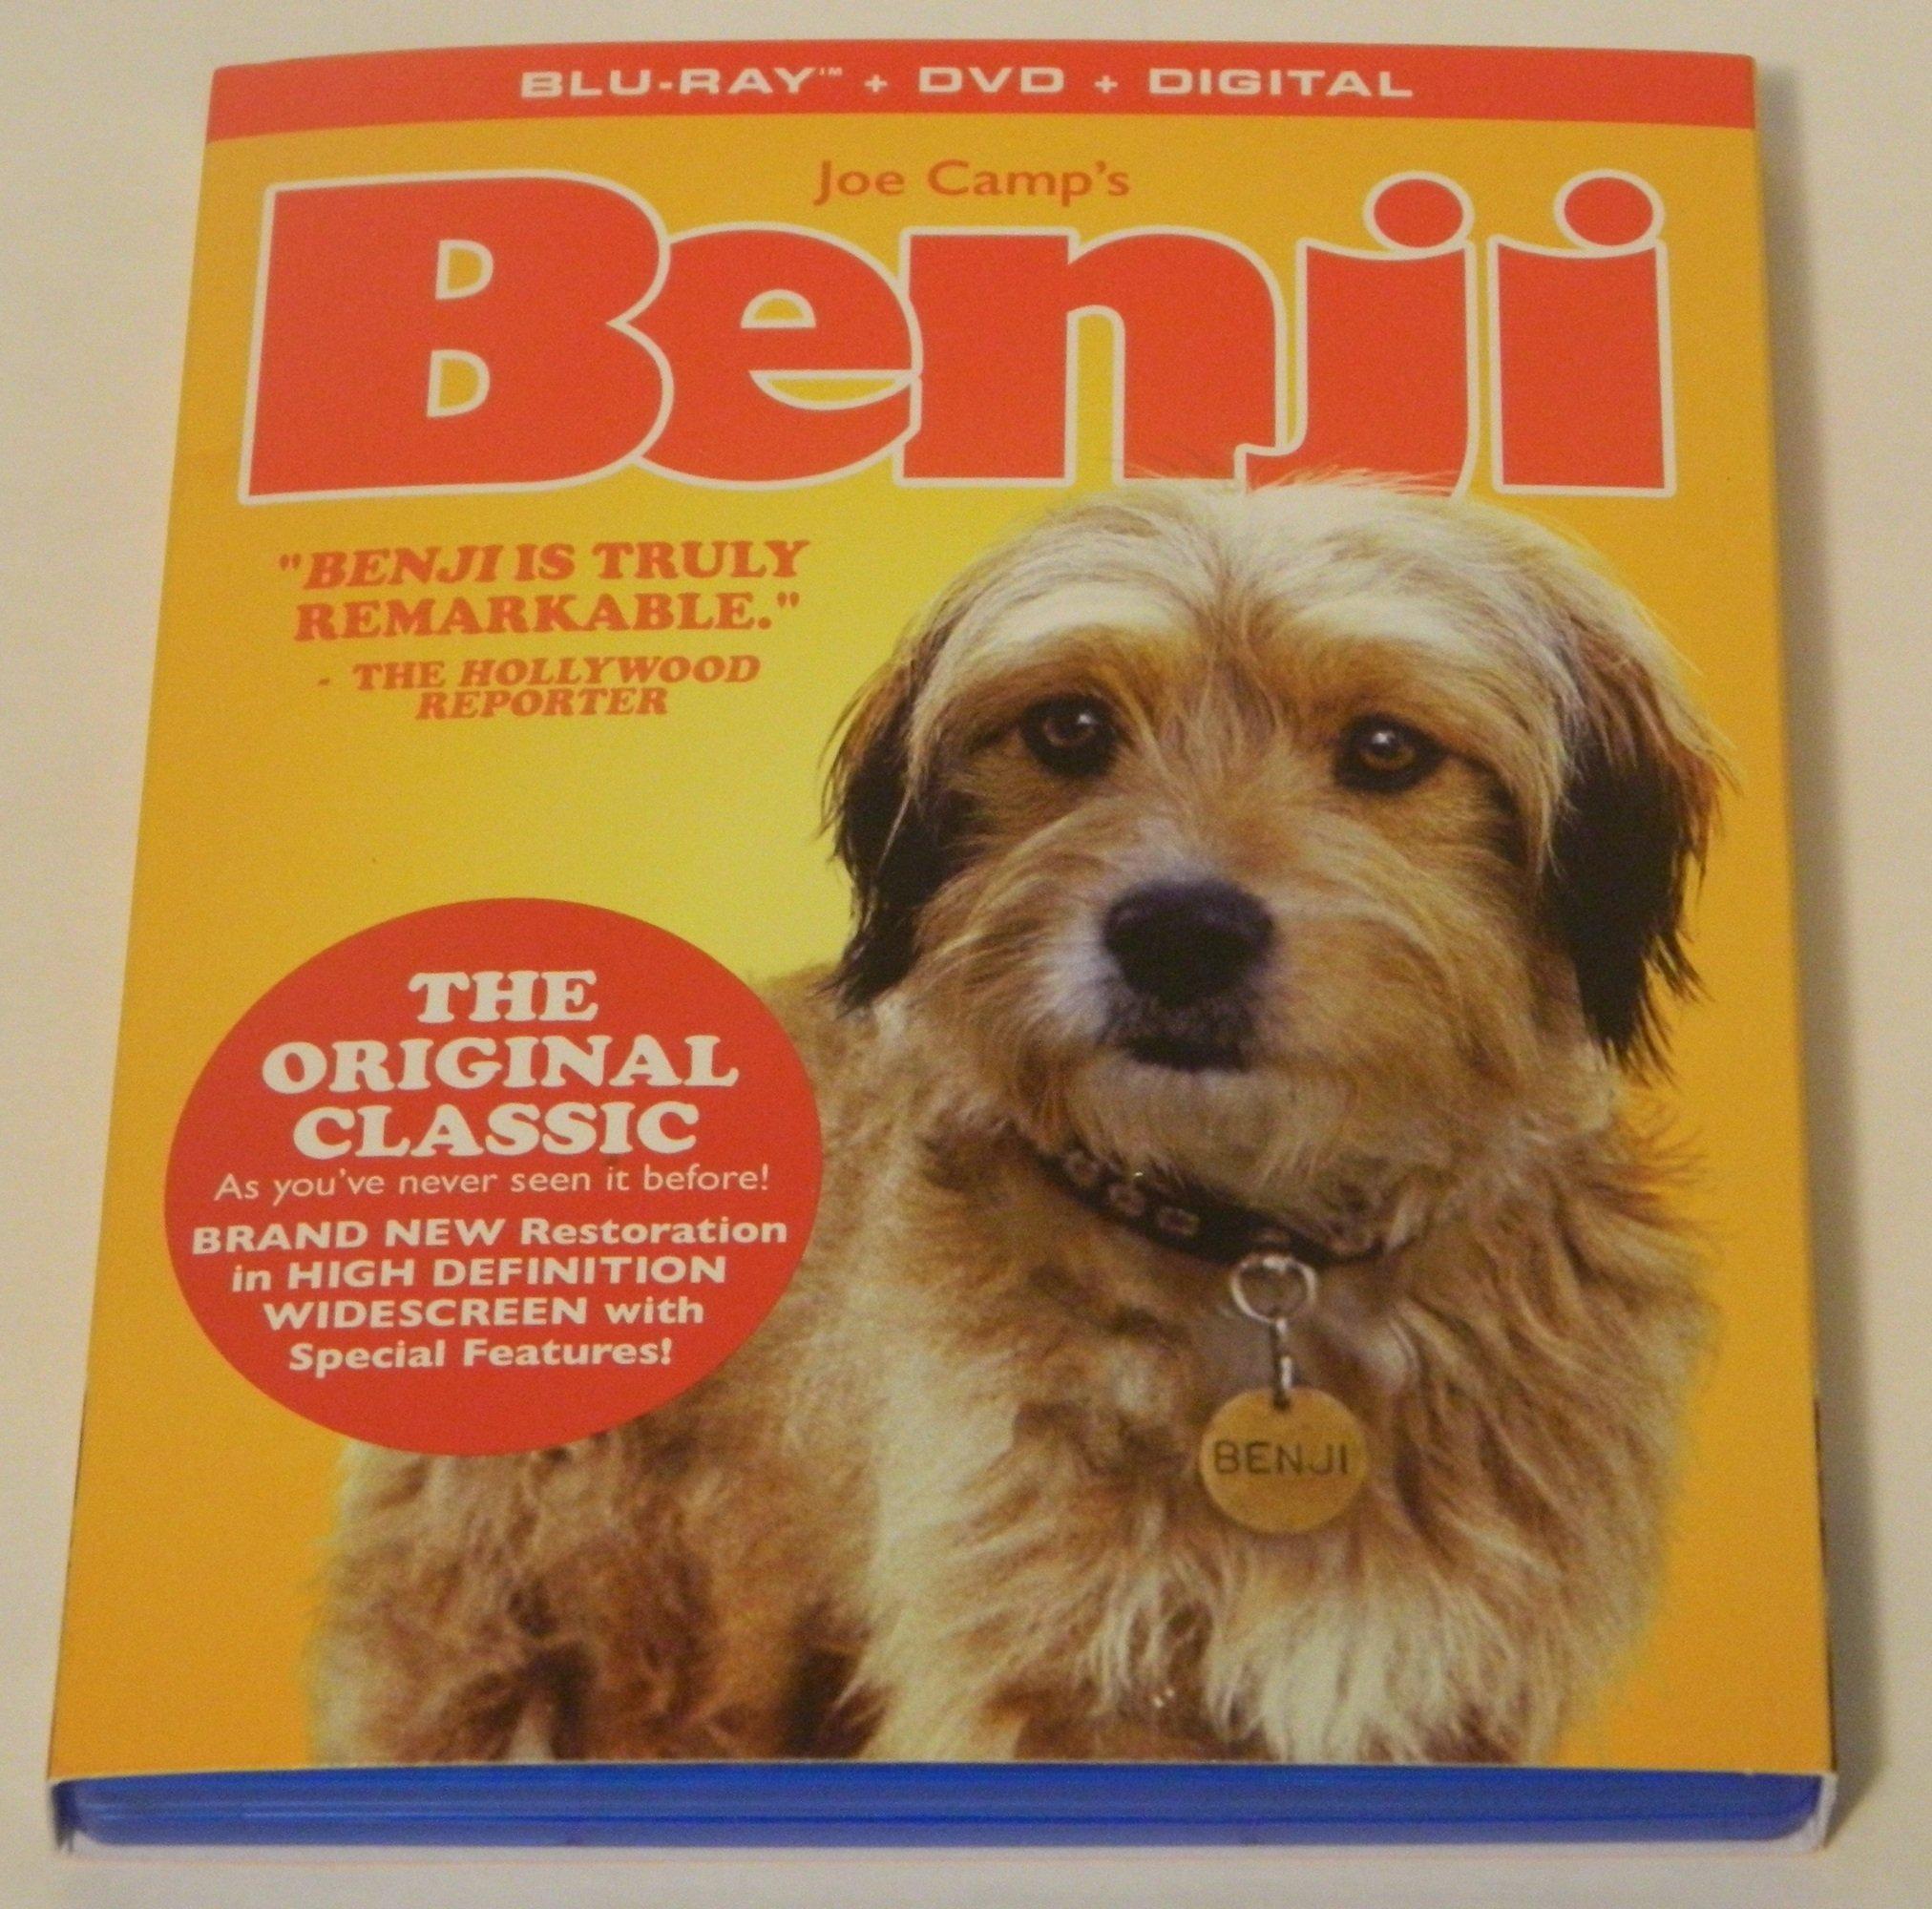 Benji Blu-ray